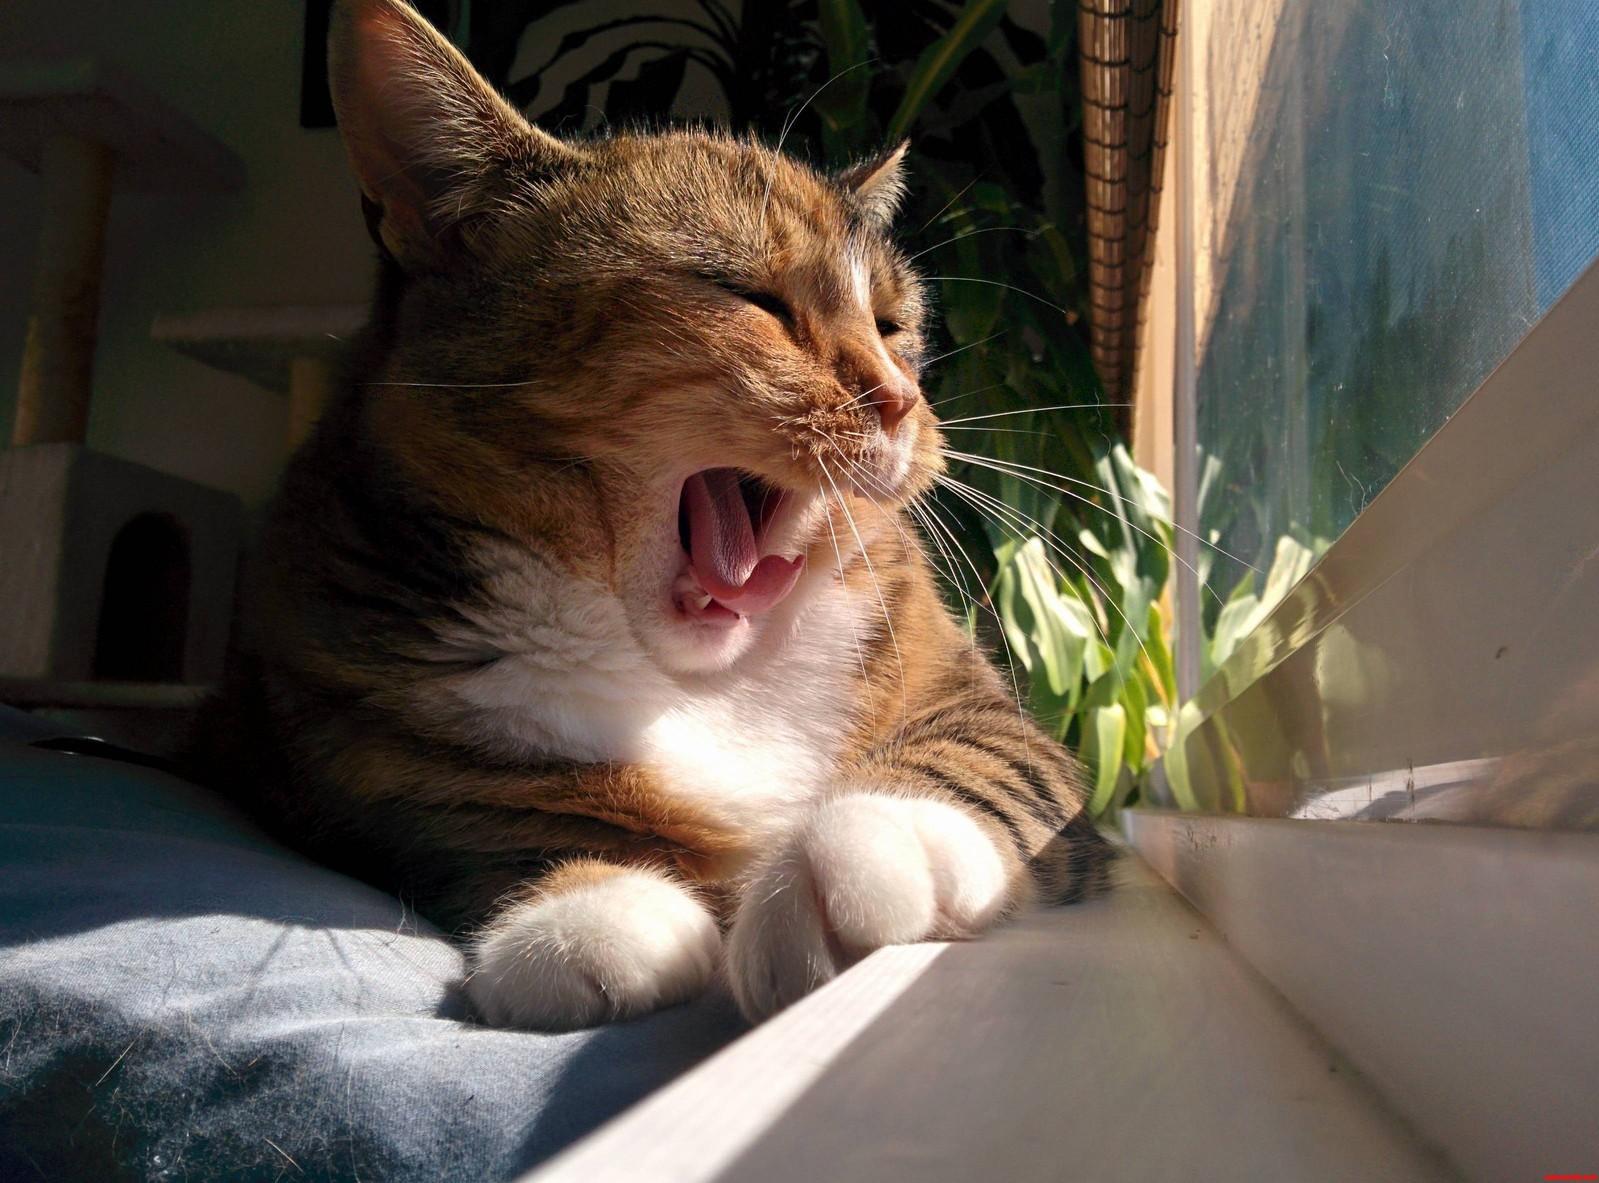 Yawns Look Like Yells